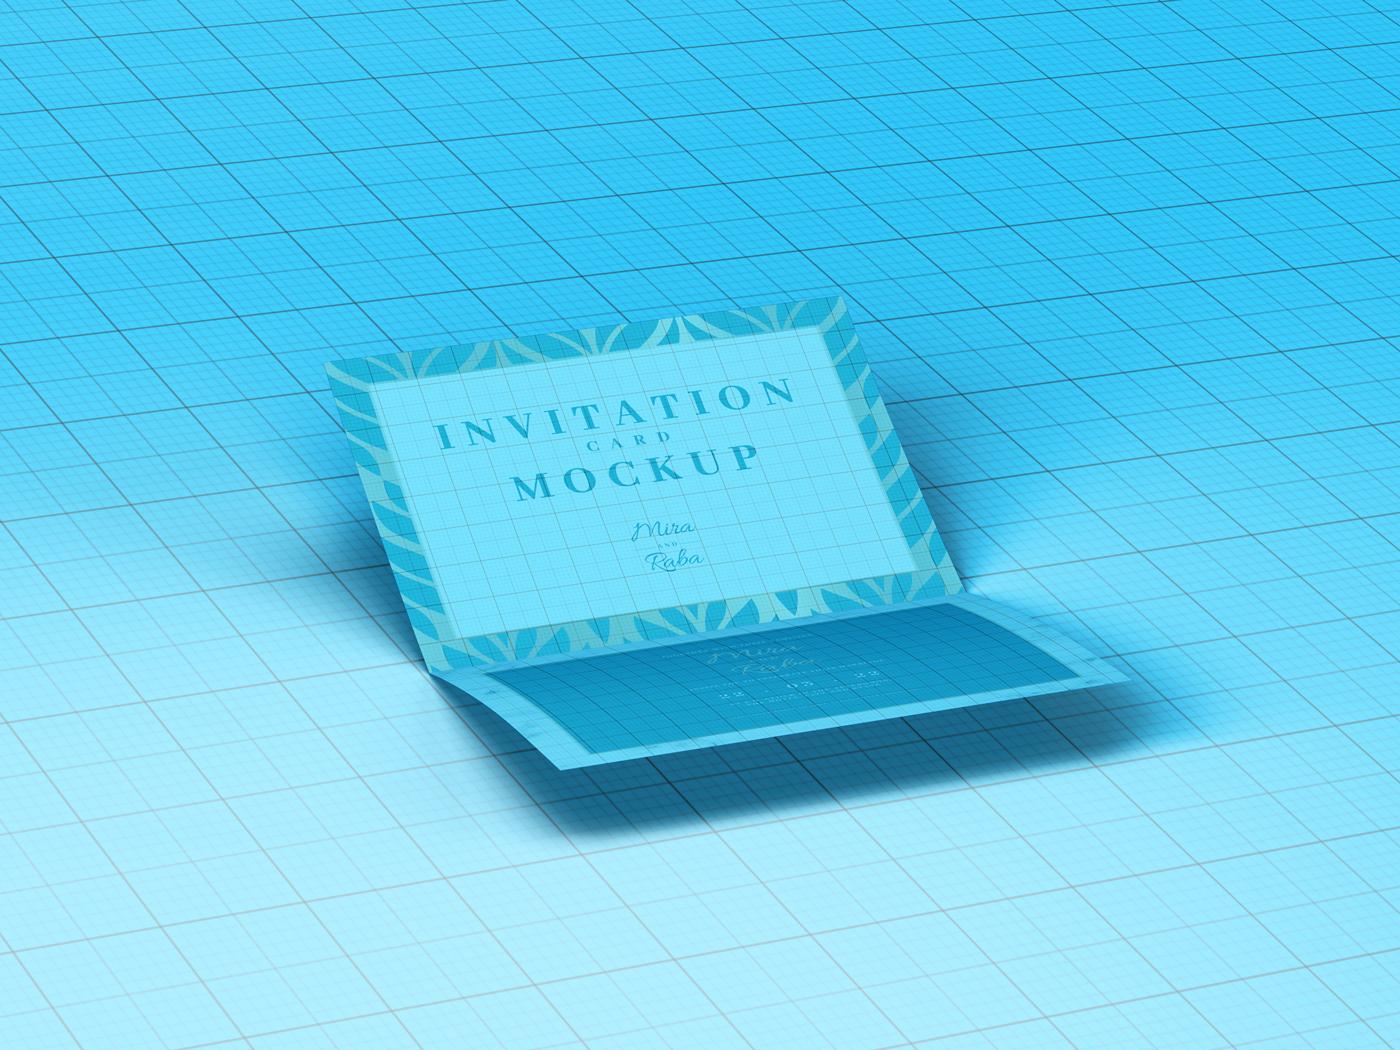 Invitation Card Mockups V1 example image 16